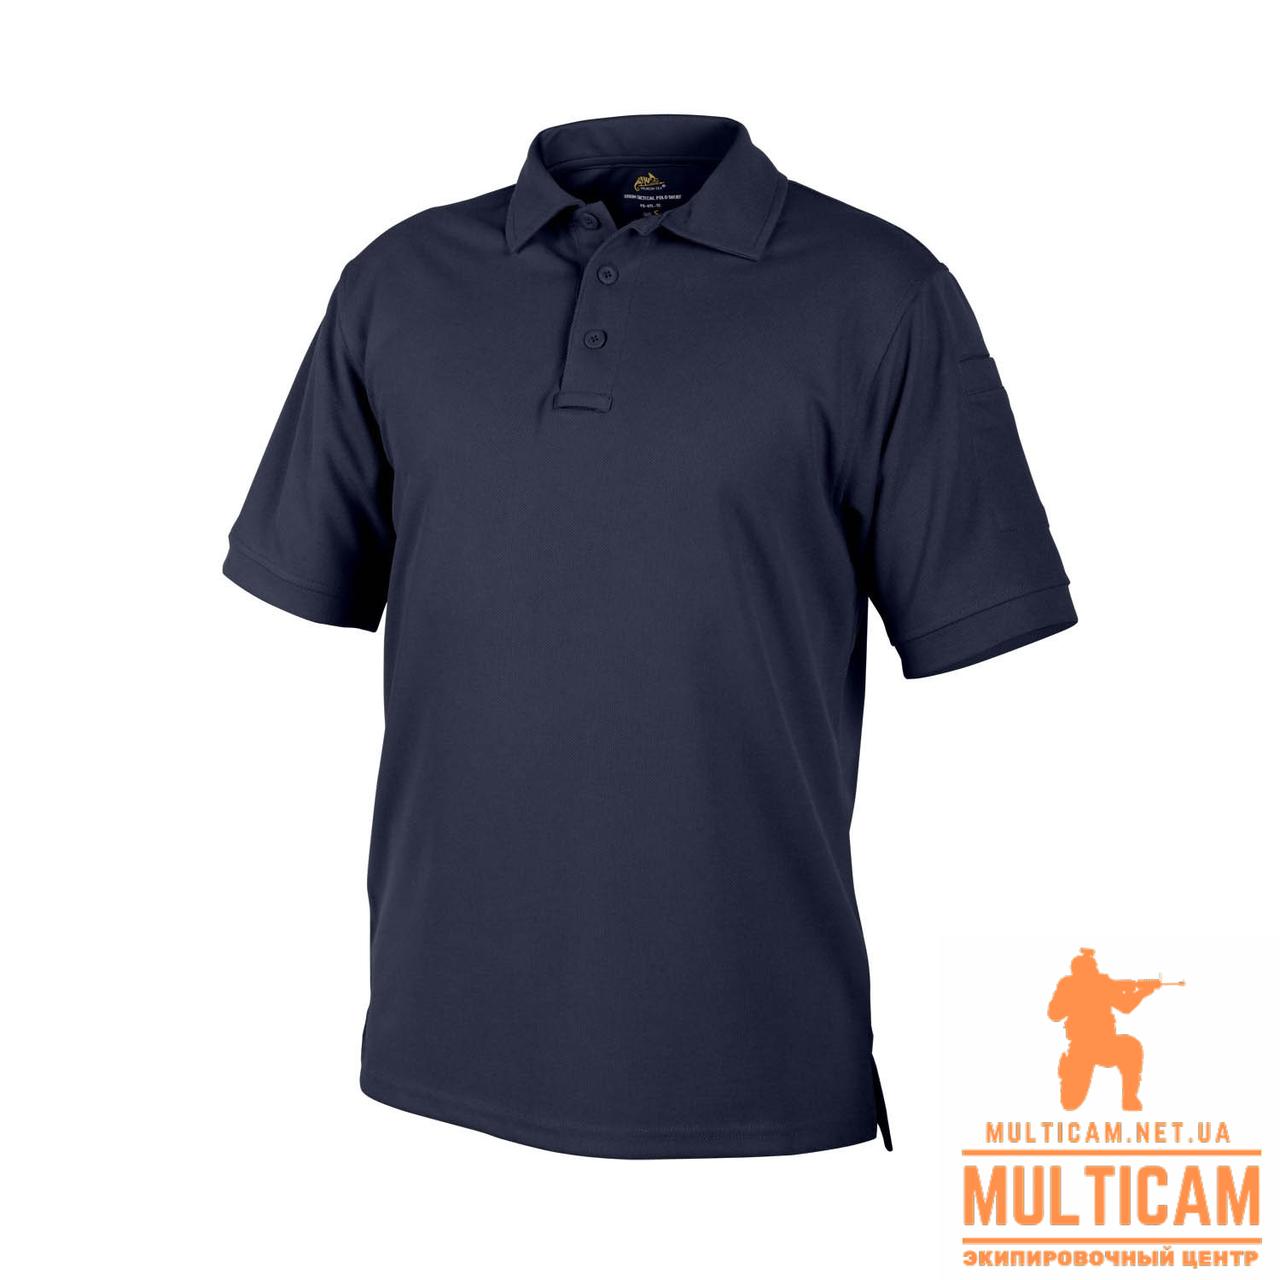 Термофутболка поло Helikon-Tex® UTL Polo Shirt - TopCool® - Navy Blue